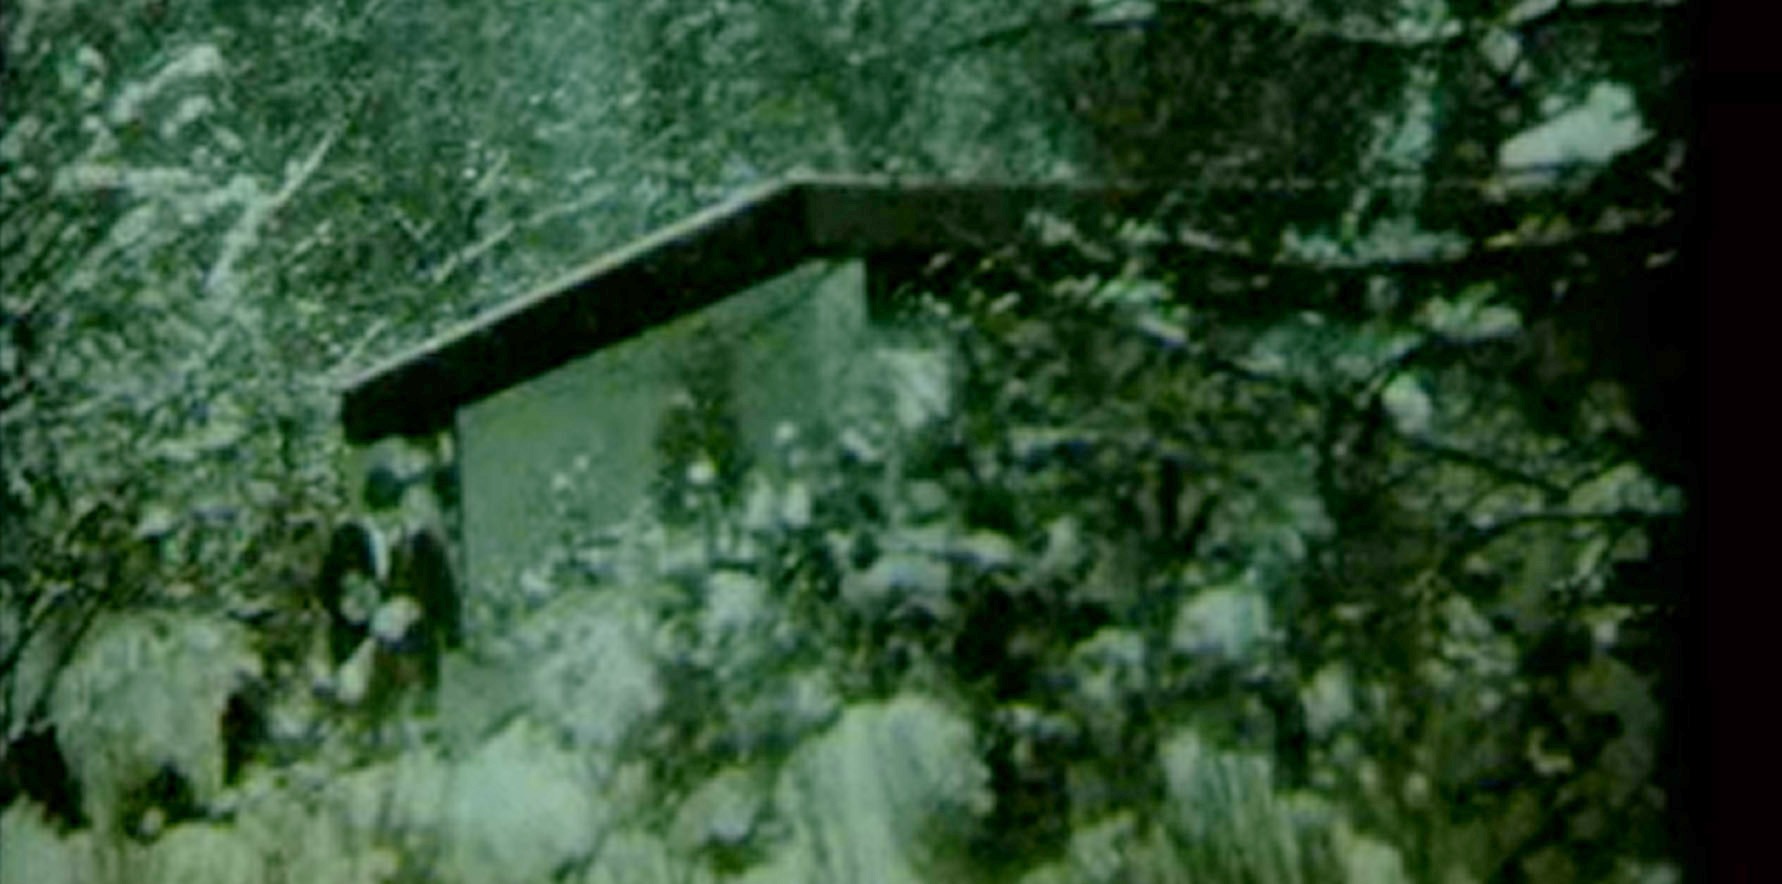 Højbjergmordet - Figurant ved gerningsstedet, december 1967